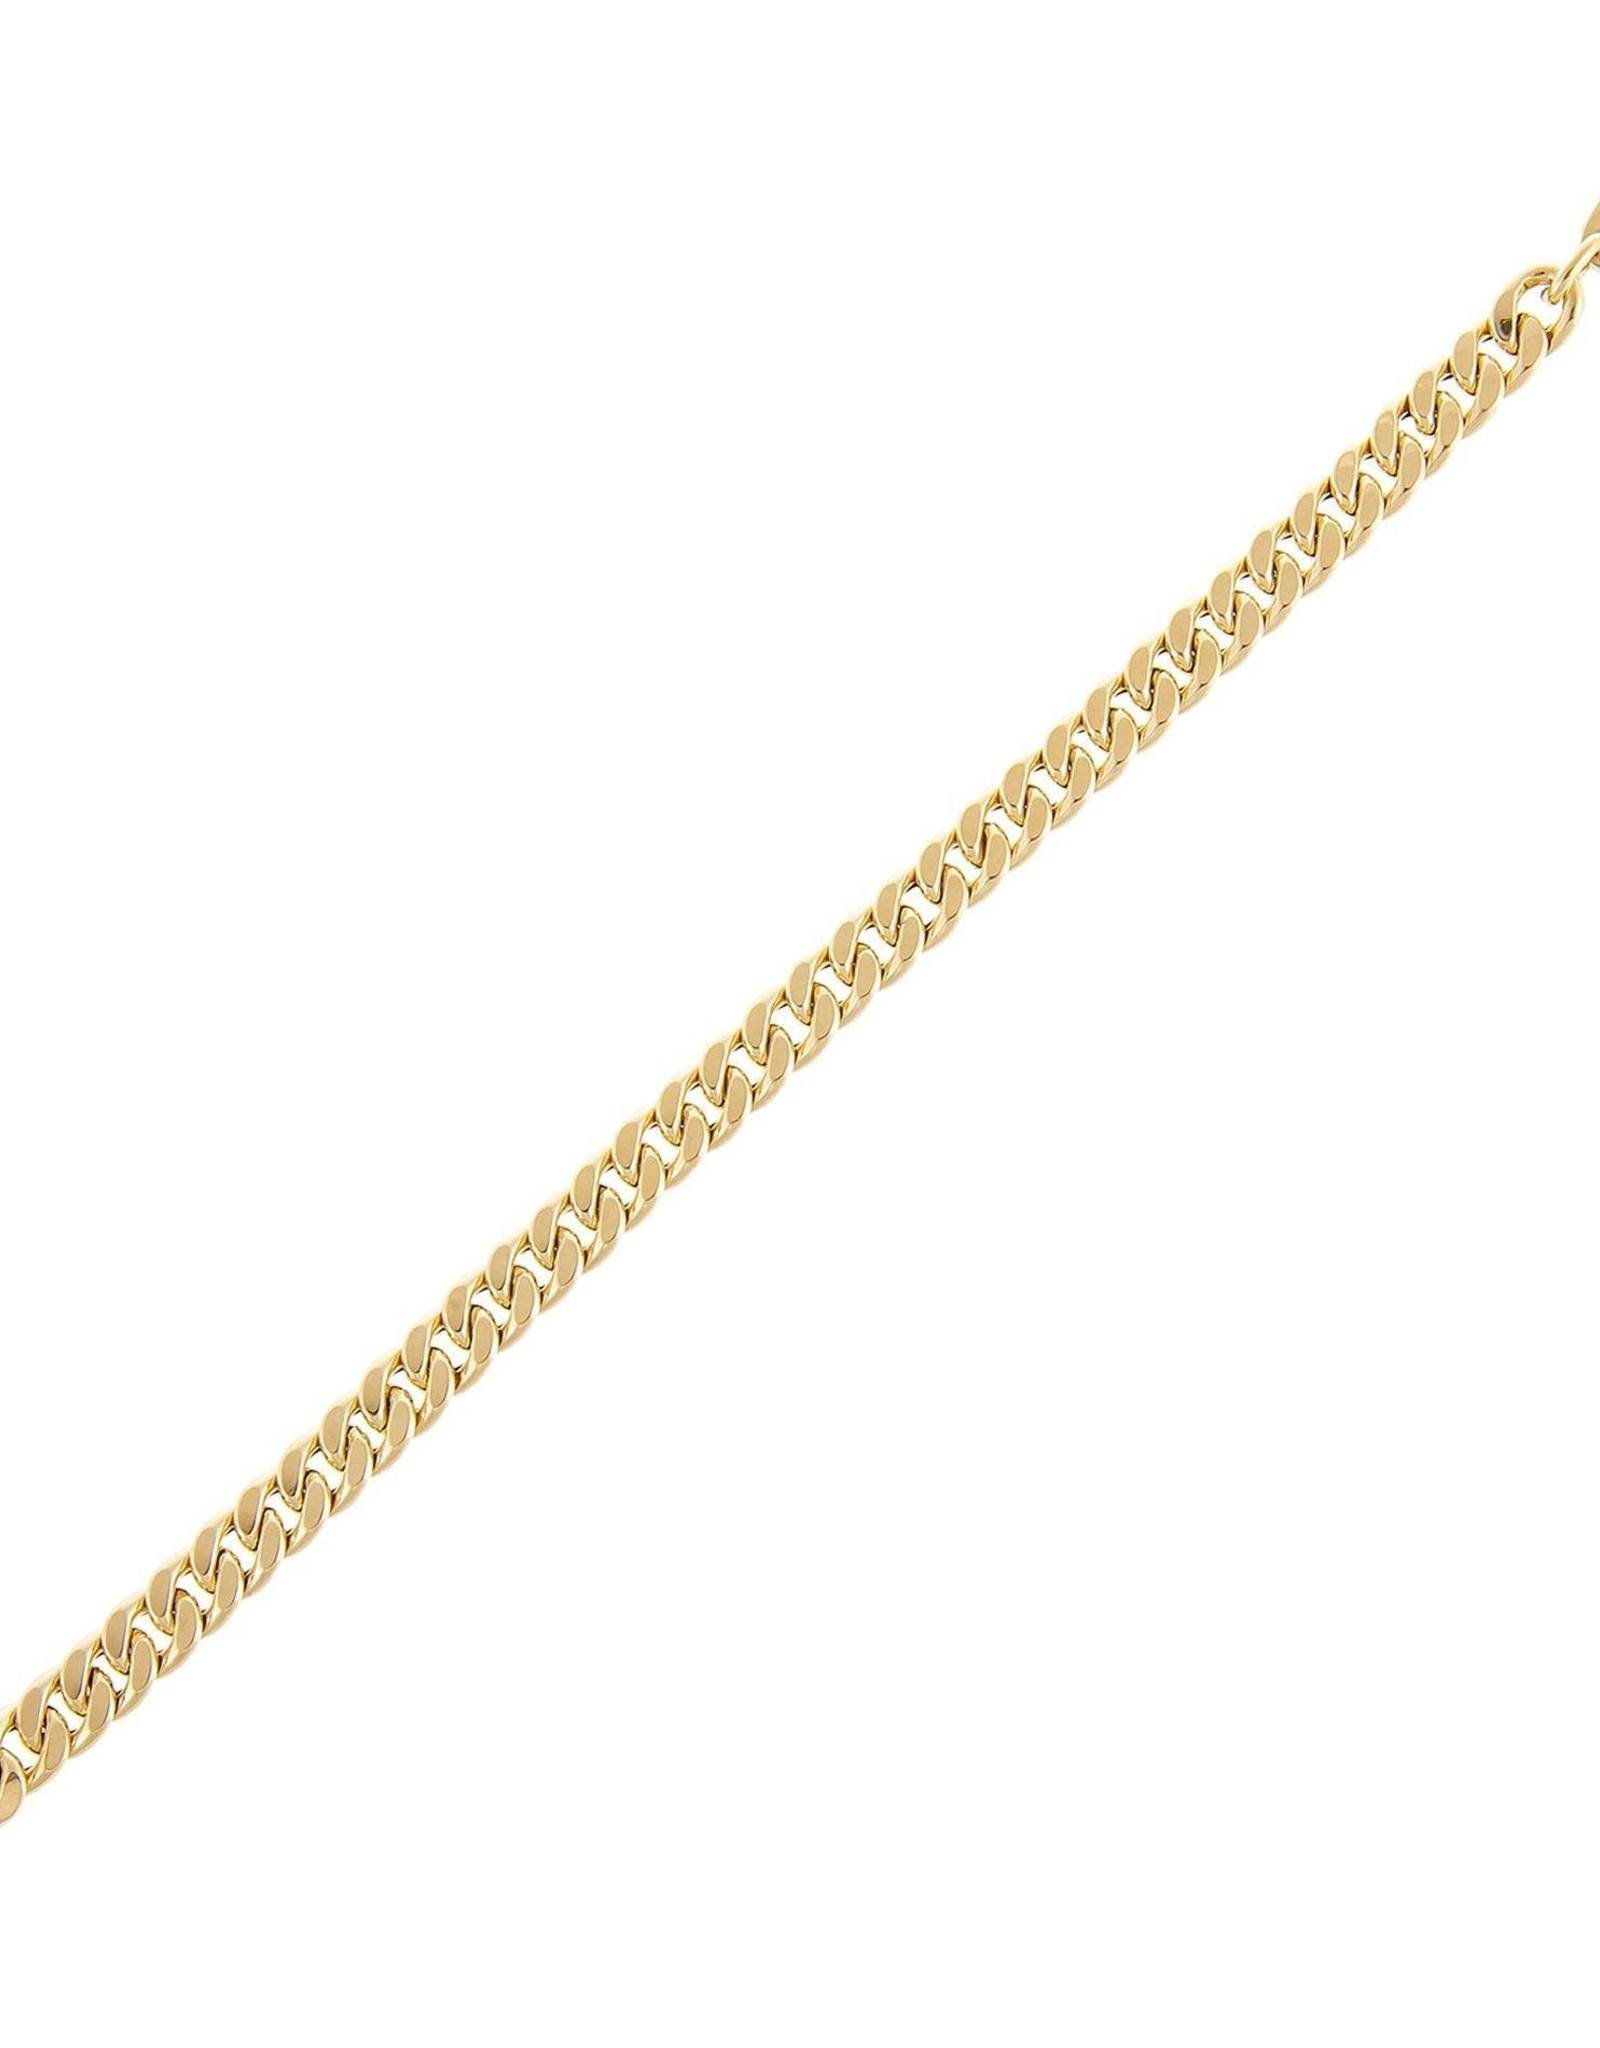 Adinas Miami Cuban Link Bracelet 14k